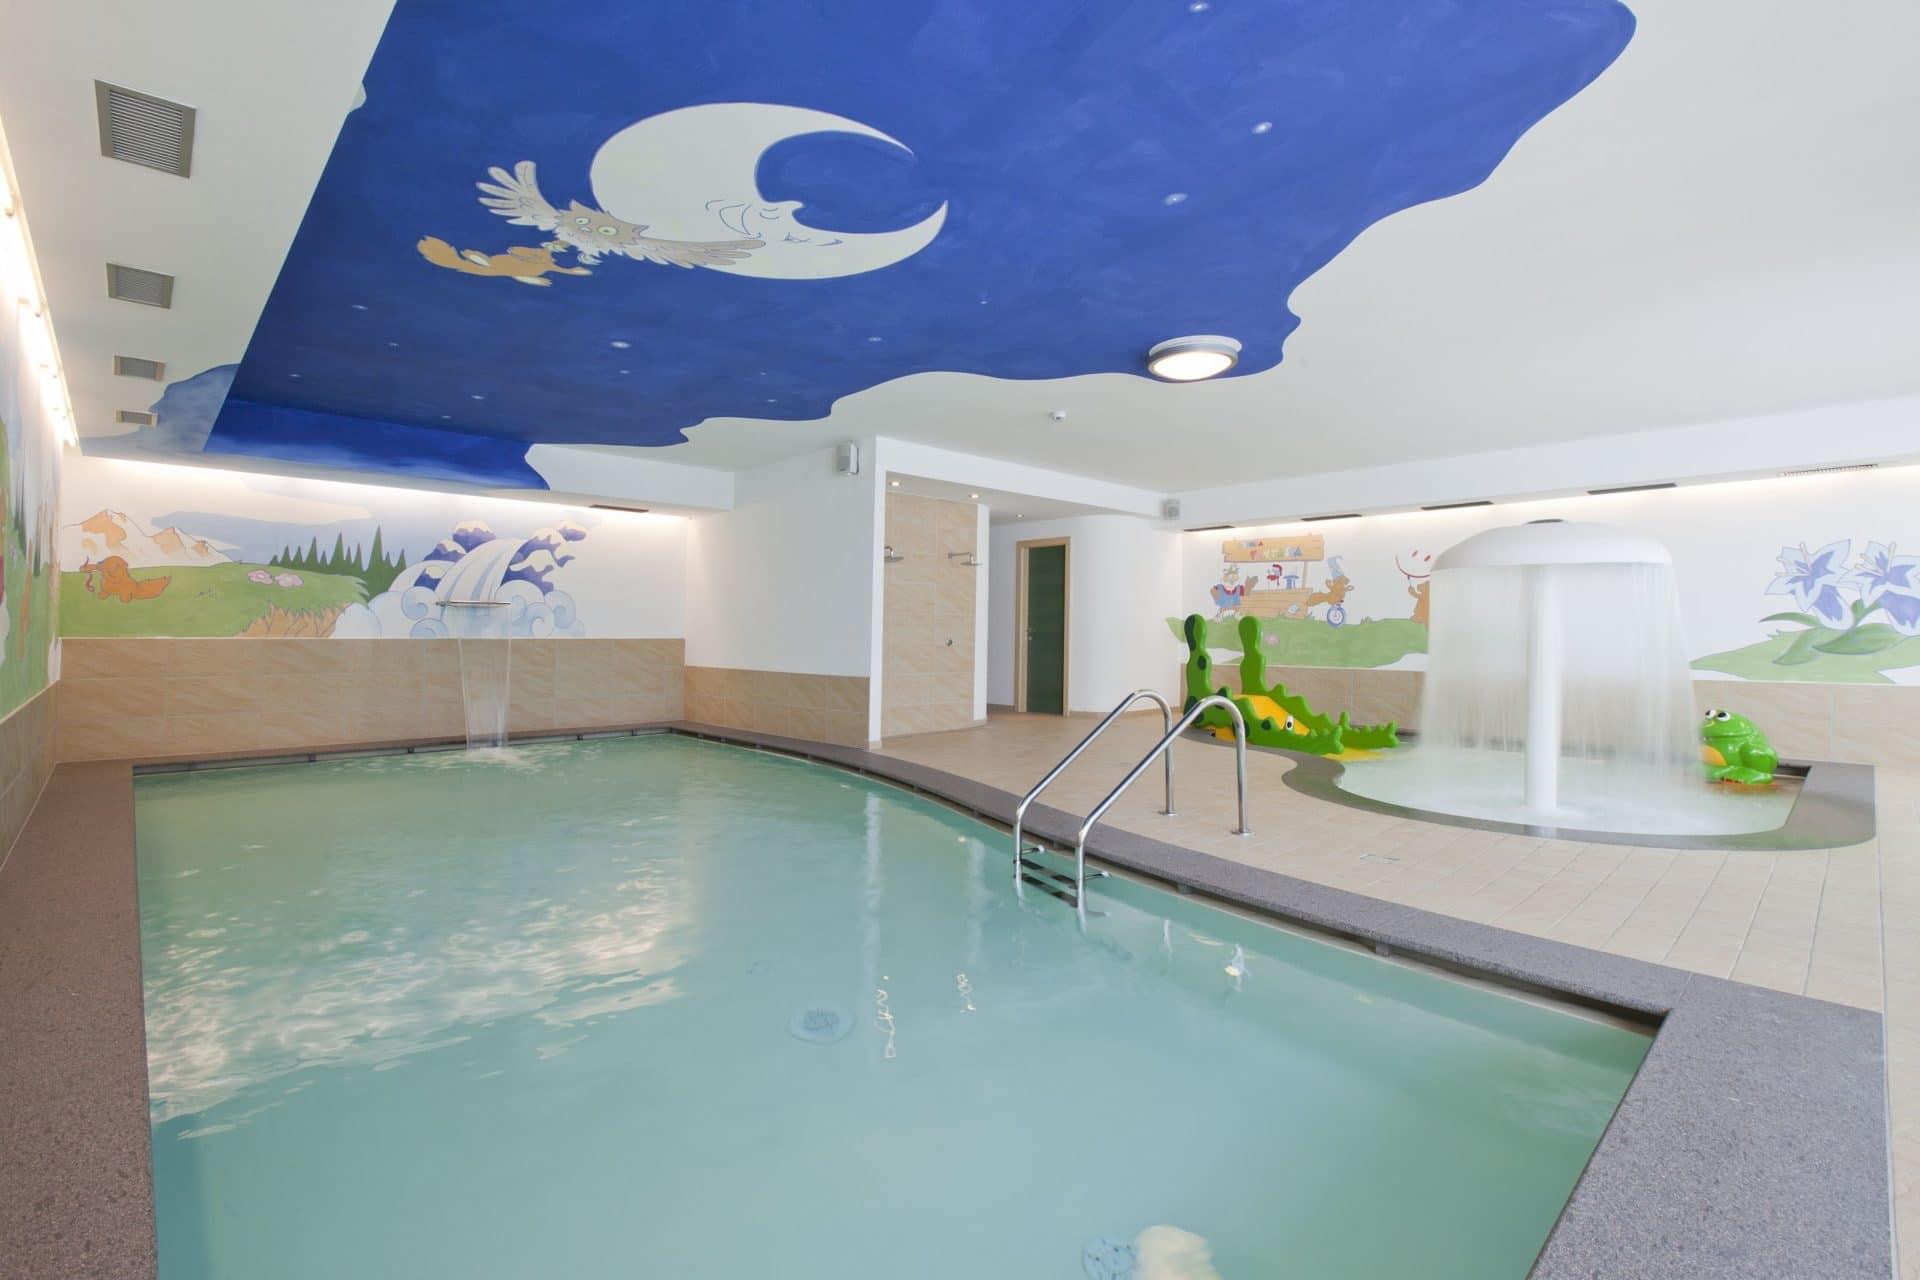 Hotel per bambini in Val di Fassa: Dolce Casa, piscine bimbi